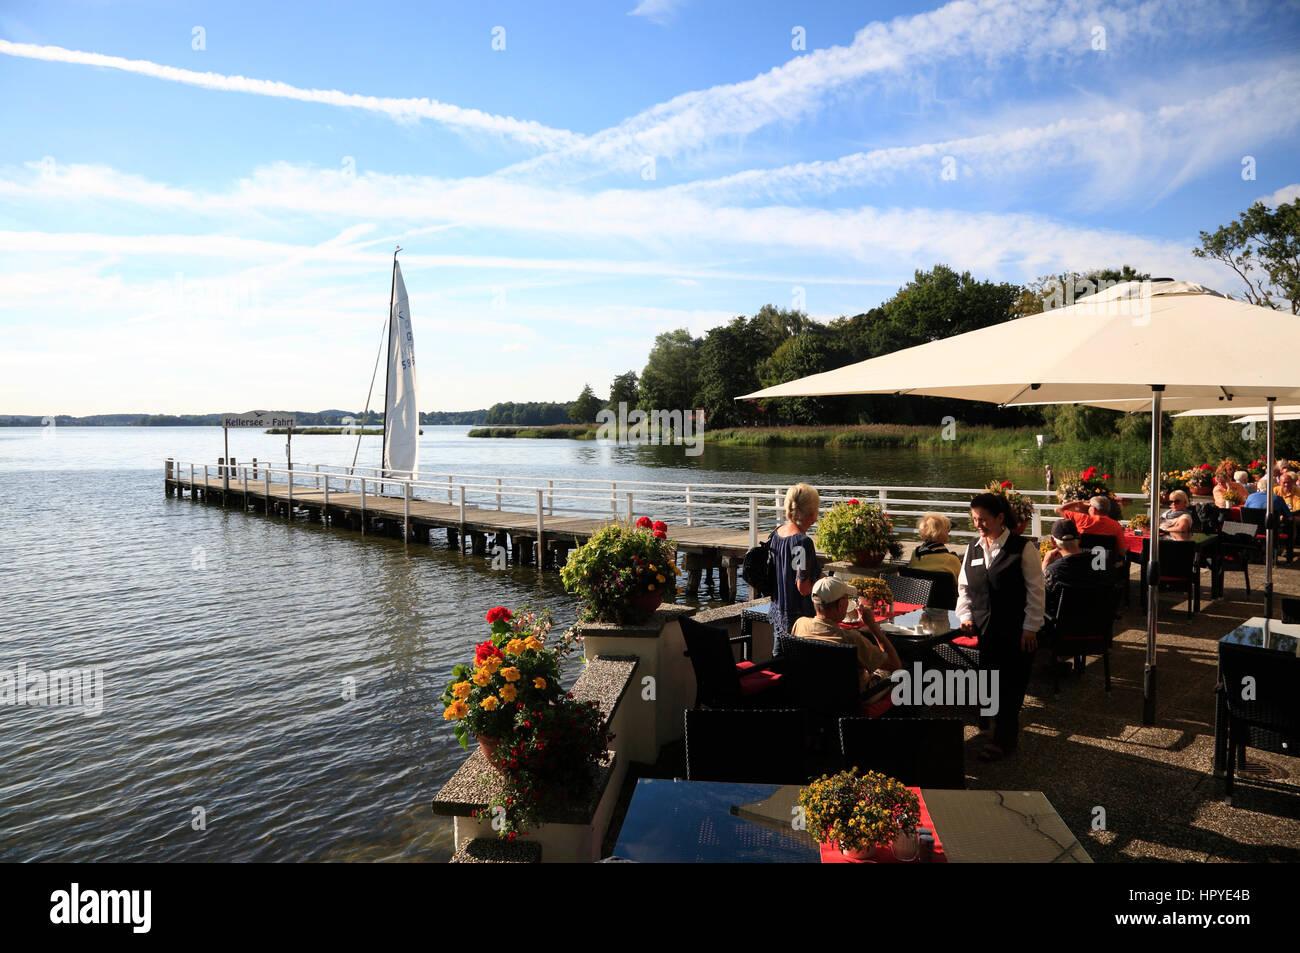 Fährhaus (ferry  house) Sielbeck-Uklei at lake Kellersee near Malente, Schleswig-Holstein, Germany, Europe - Stock Image